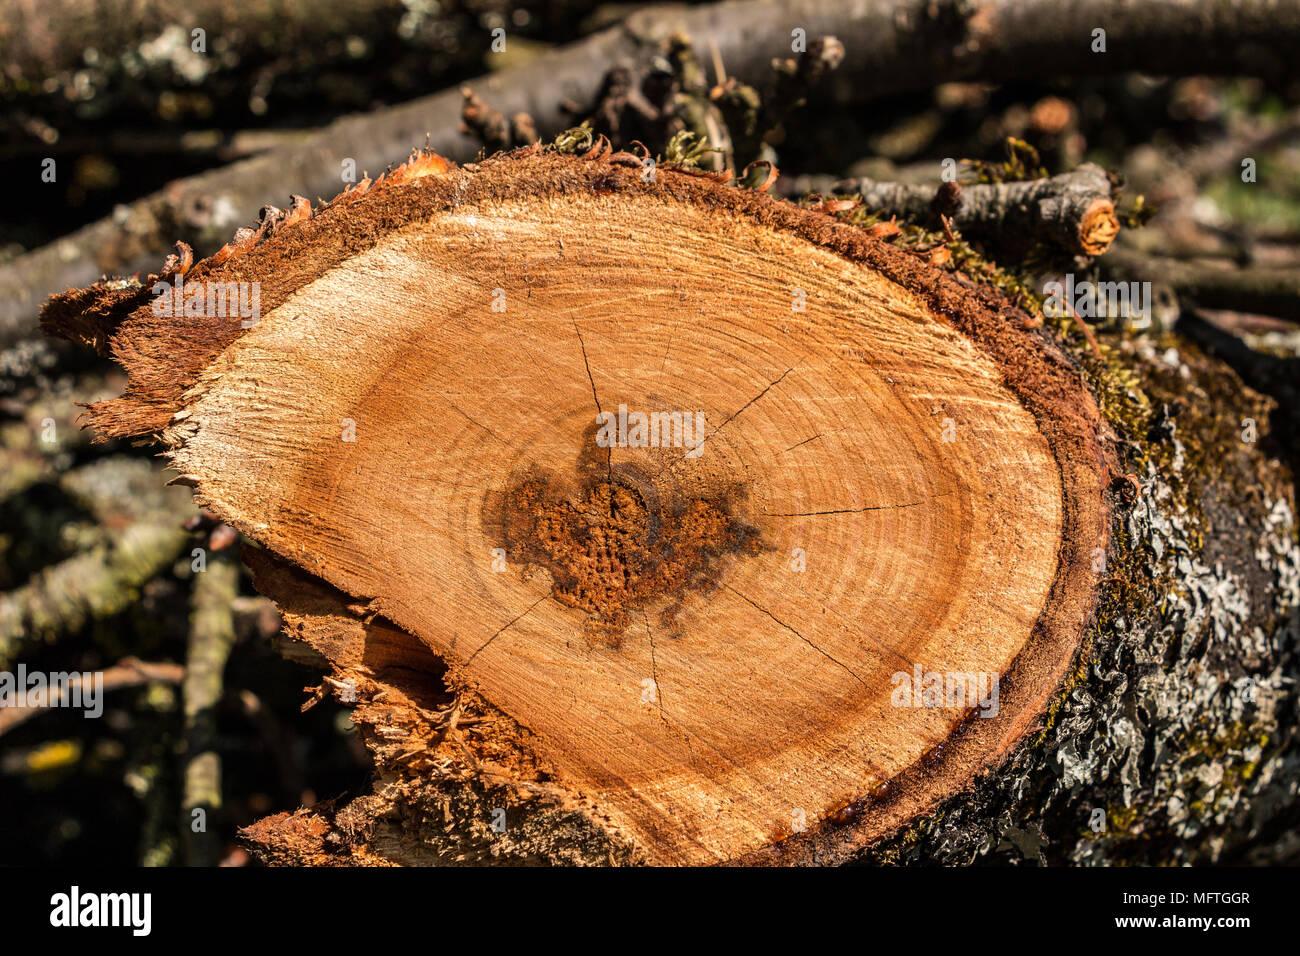 Gesägte Holz im Garten Stockbild